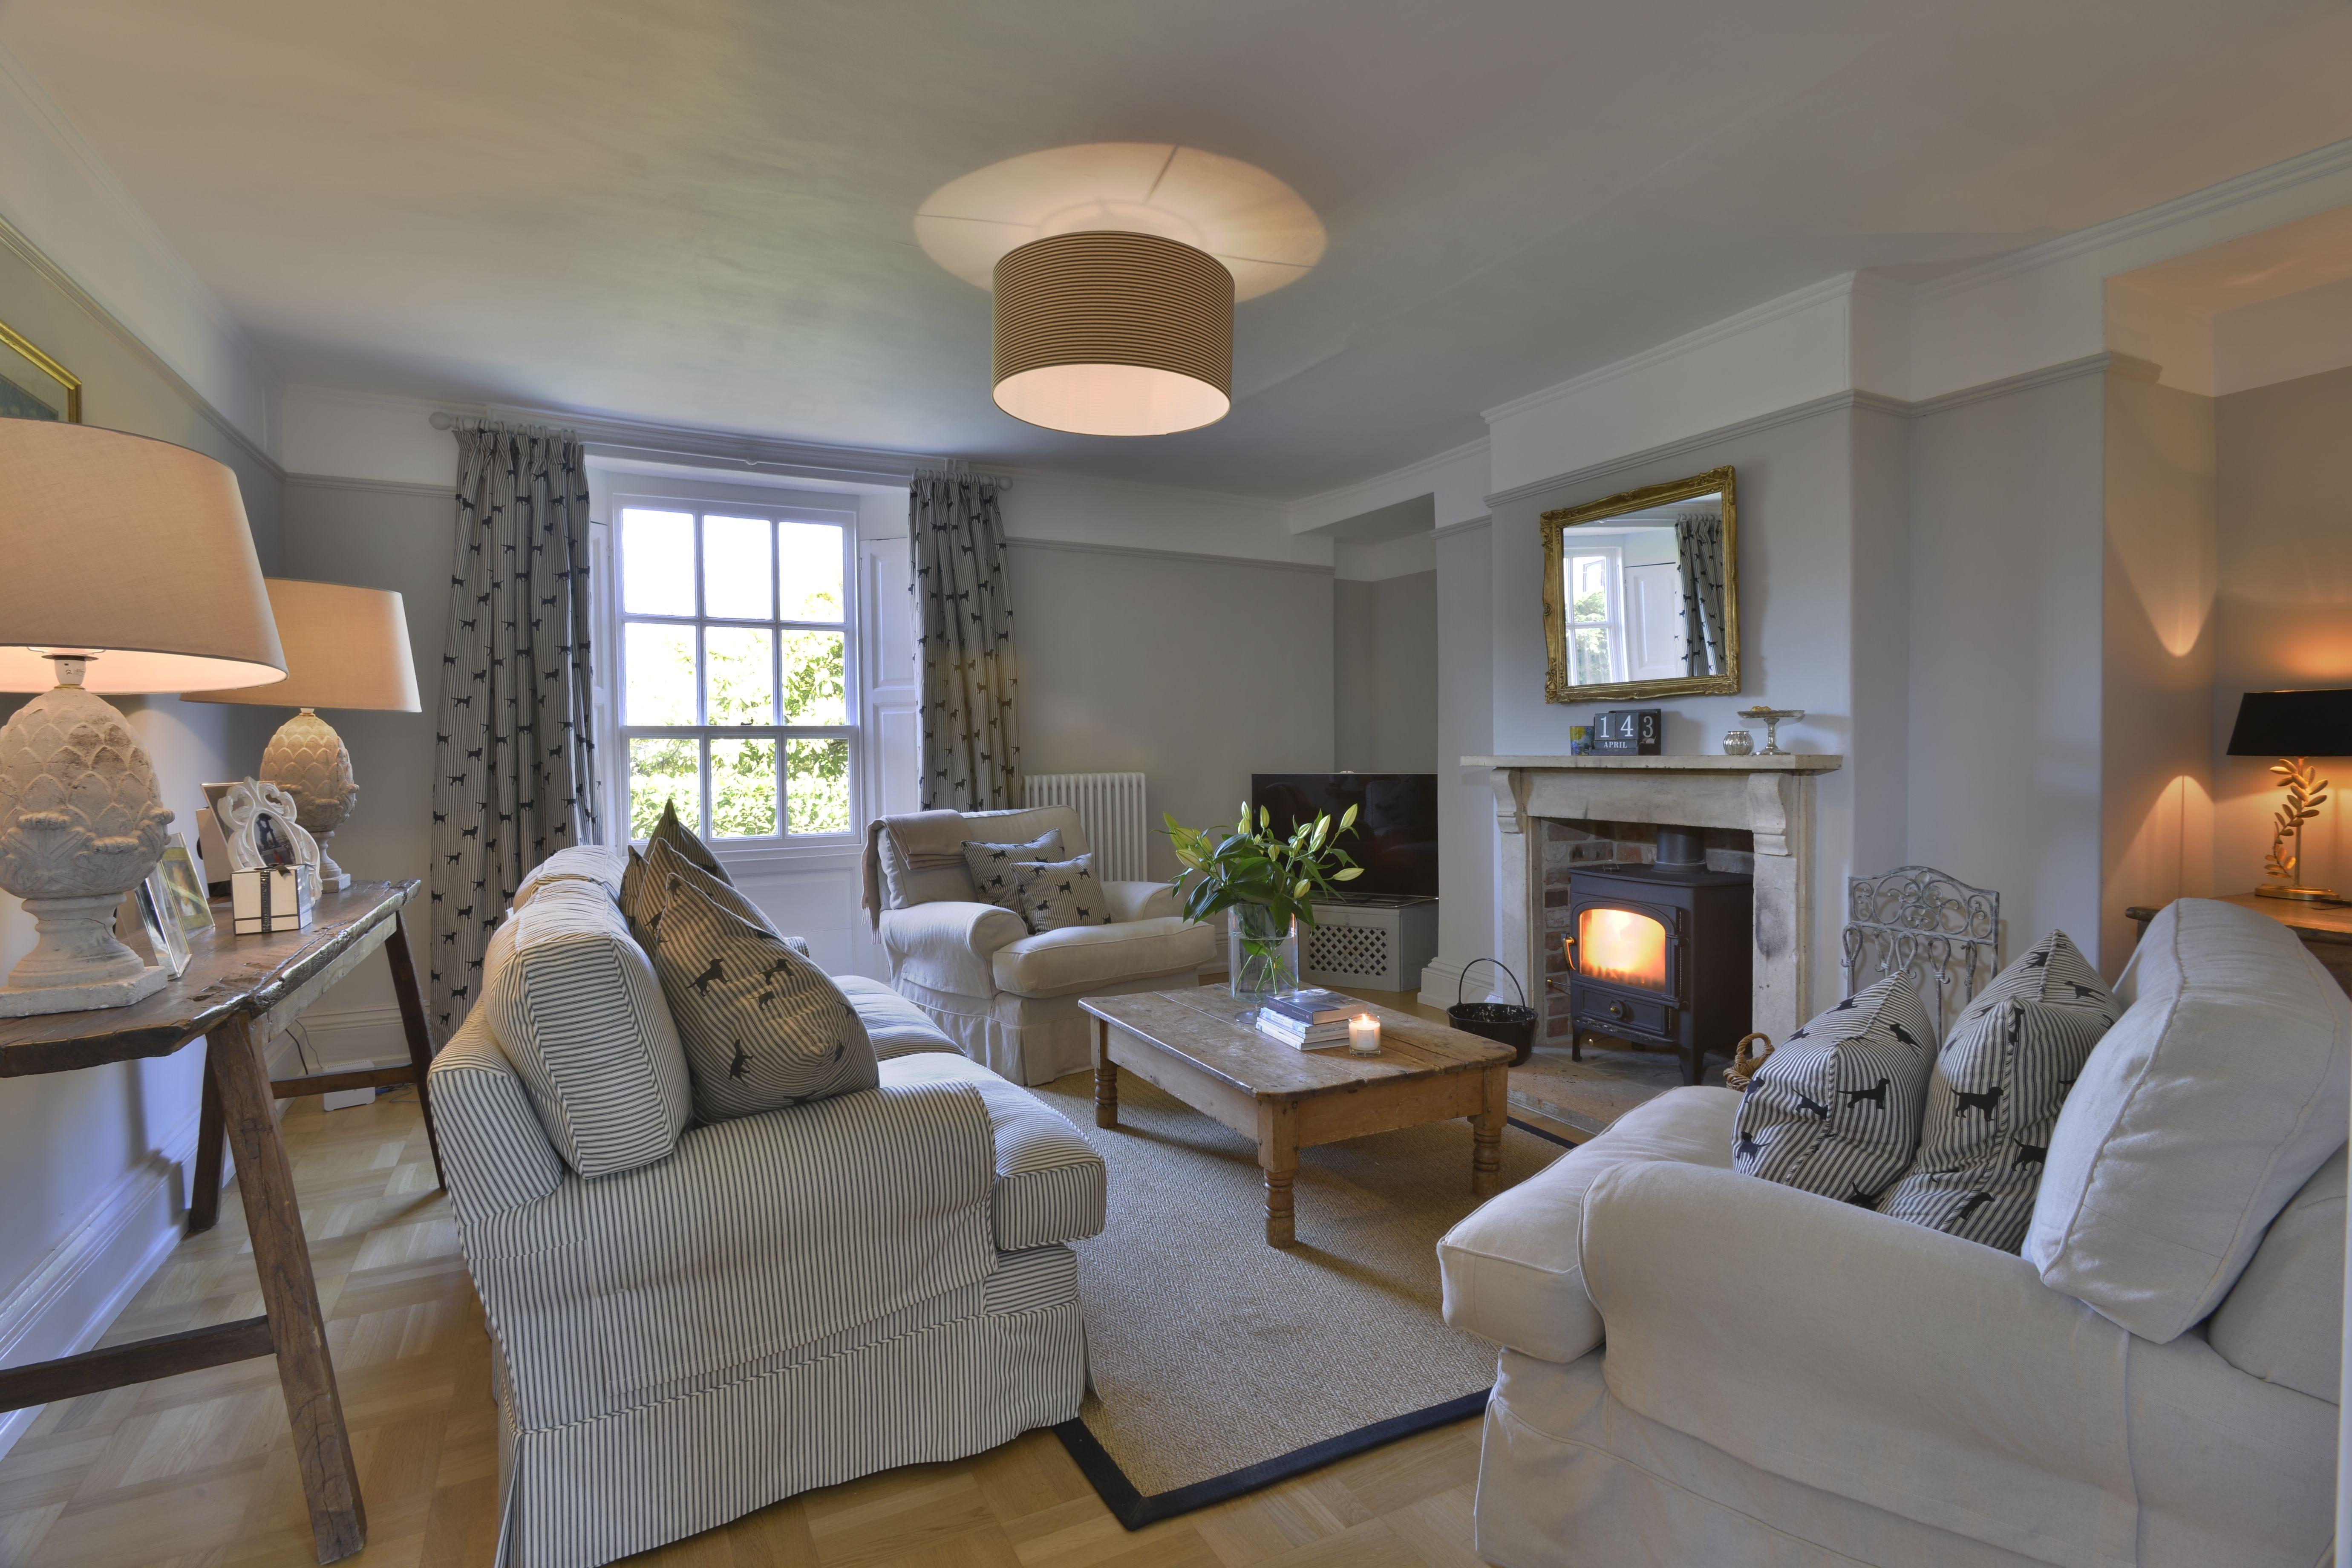 Farrow and ball cornforth white living room pinterest more